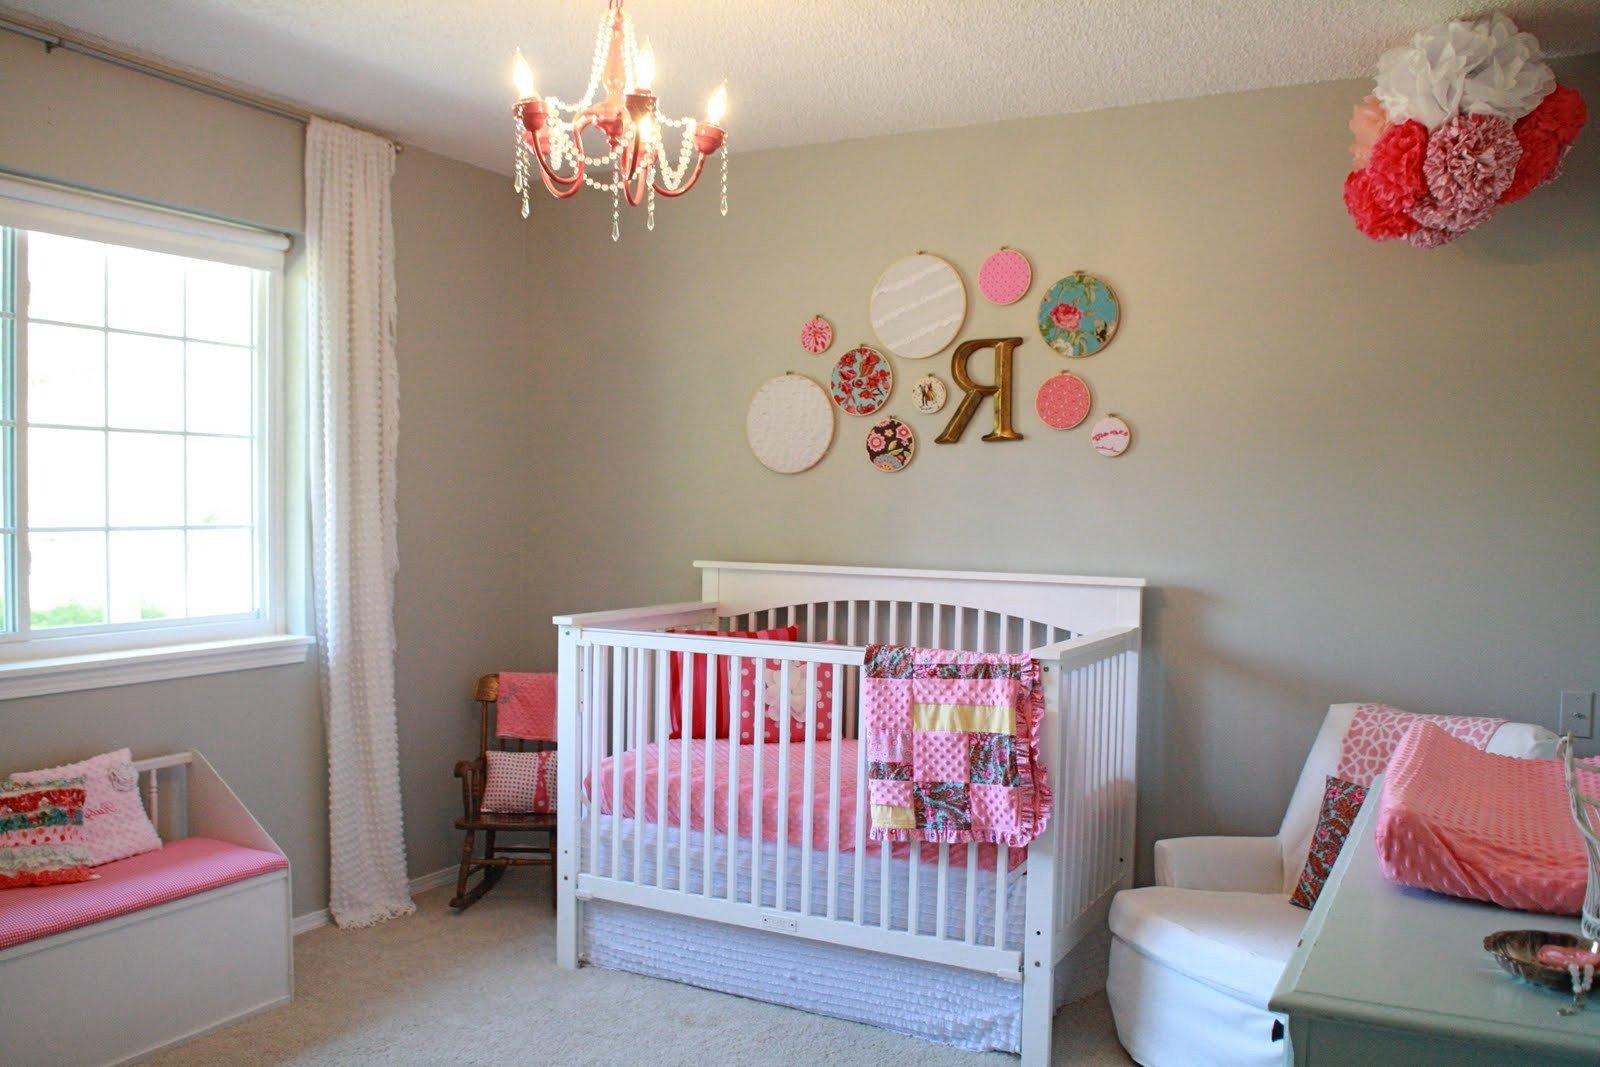 Baby Girls Room Decor Ideas Awesome Baby Girl Room Decor Ideas